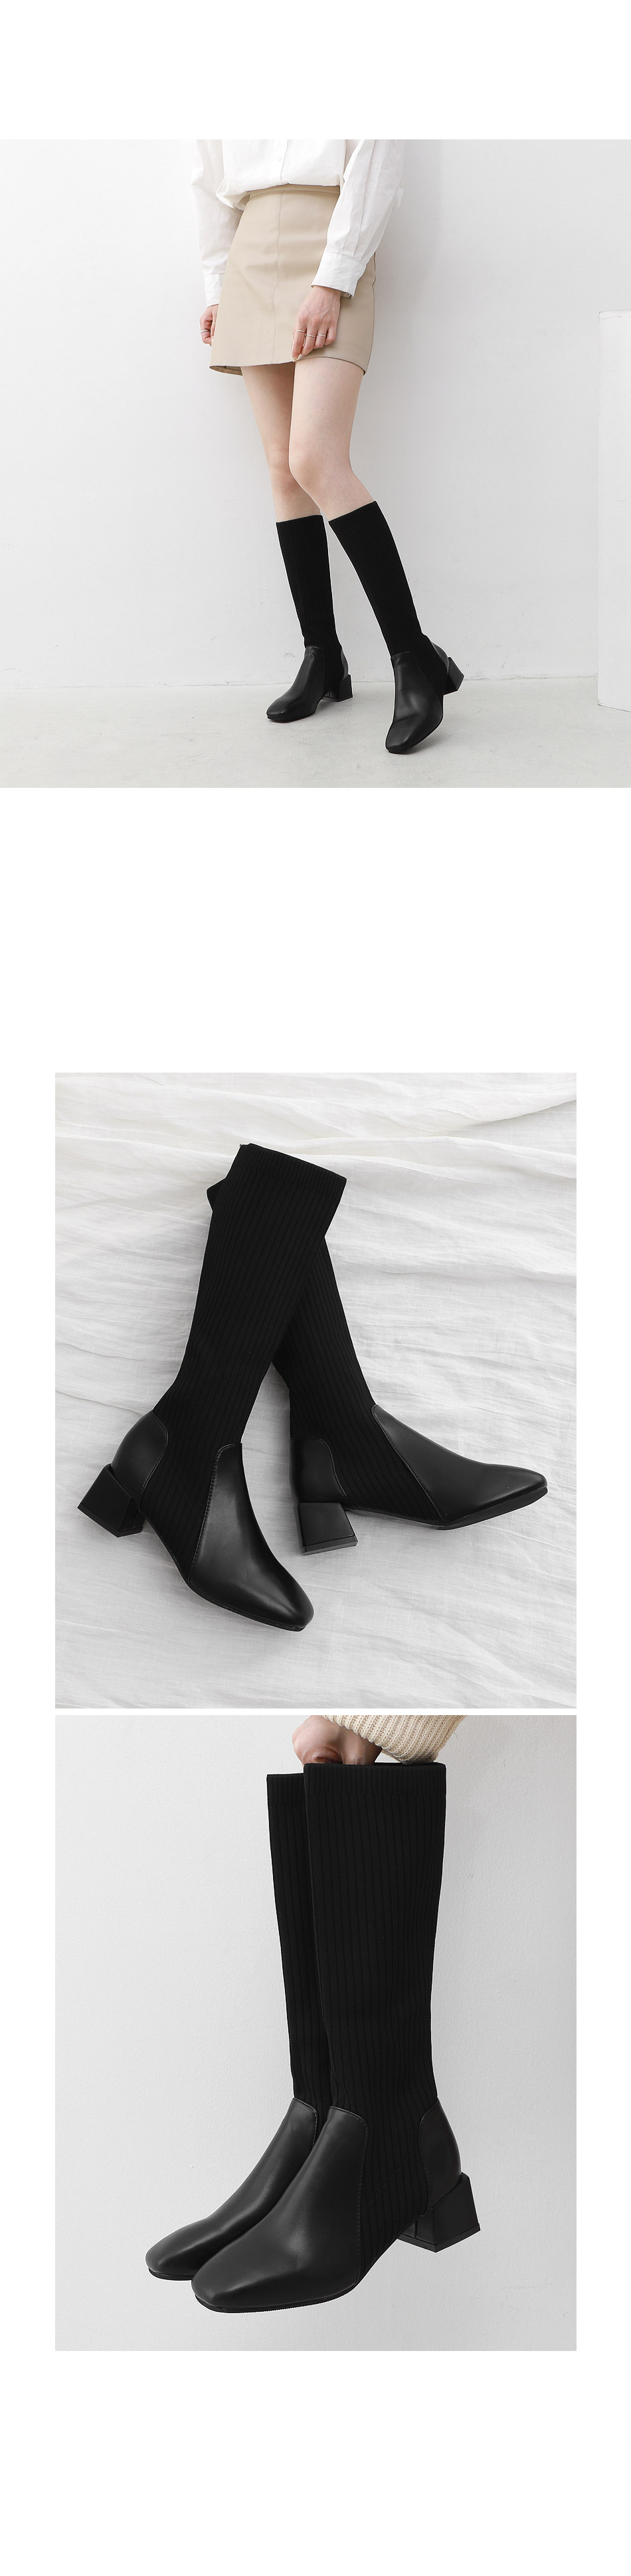 Shibori Knitwear Combi Square Nose Middle Heel Long Boots 11097